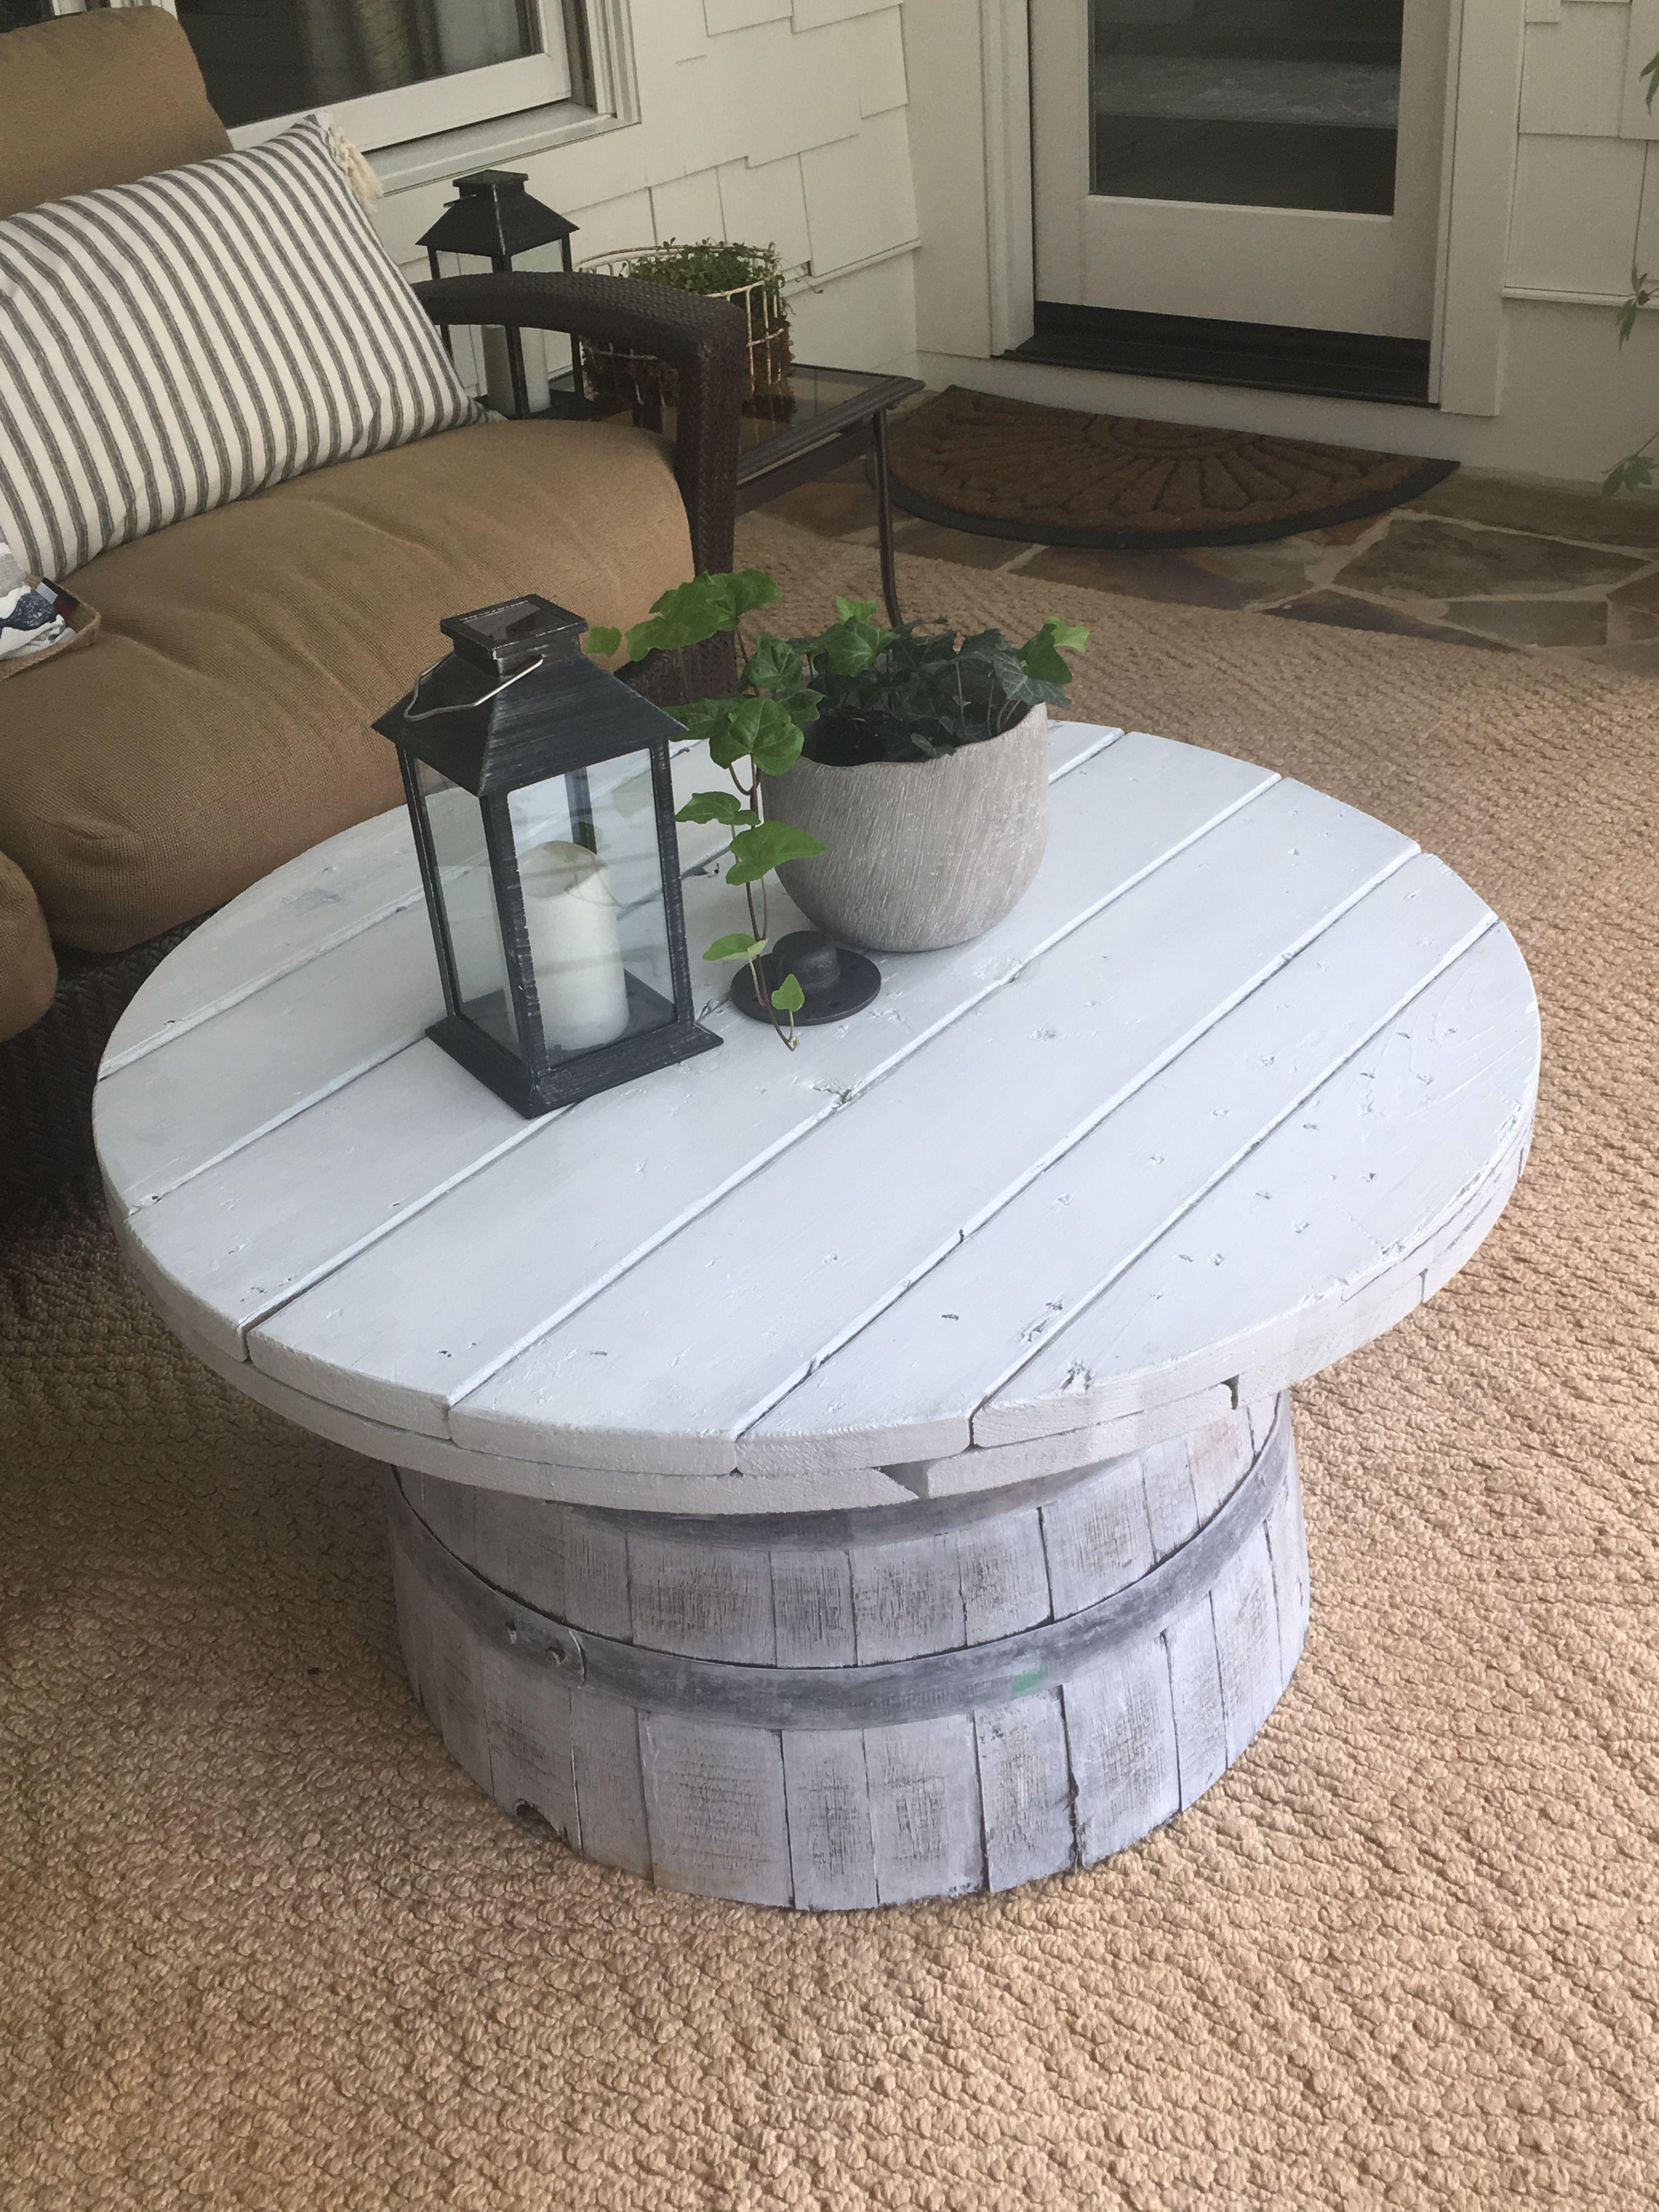 Repurposed half barrel and spool top make a great outdoor patio